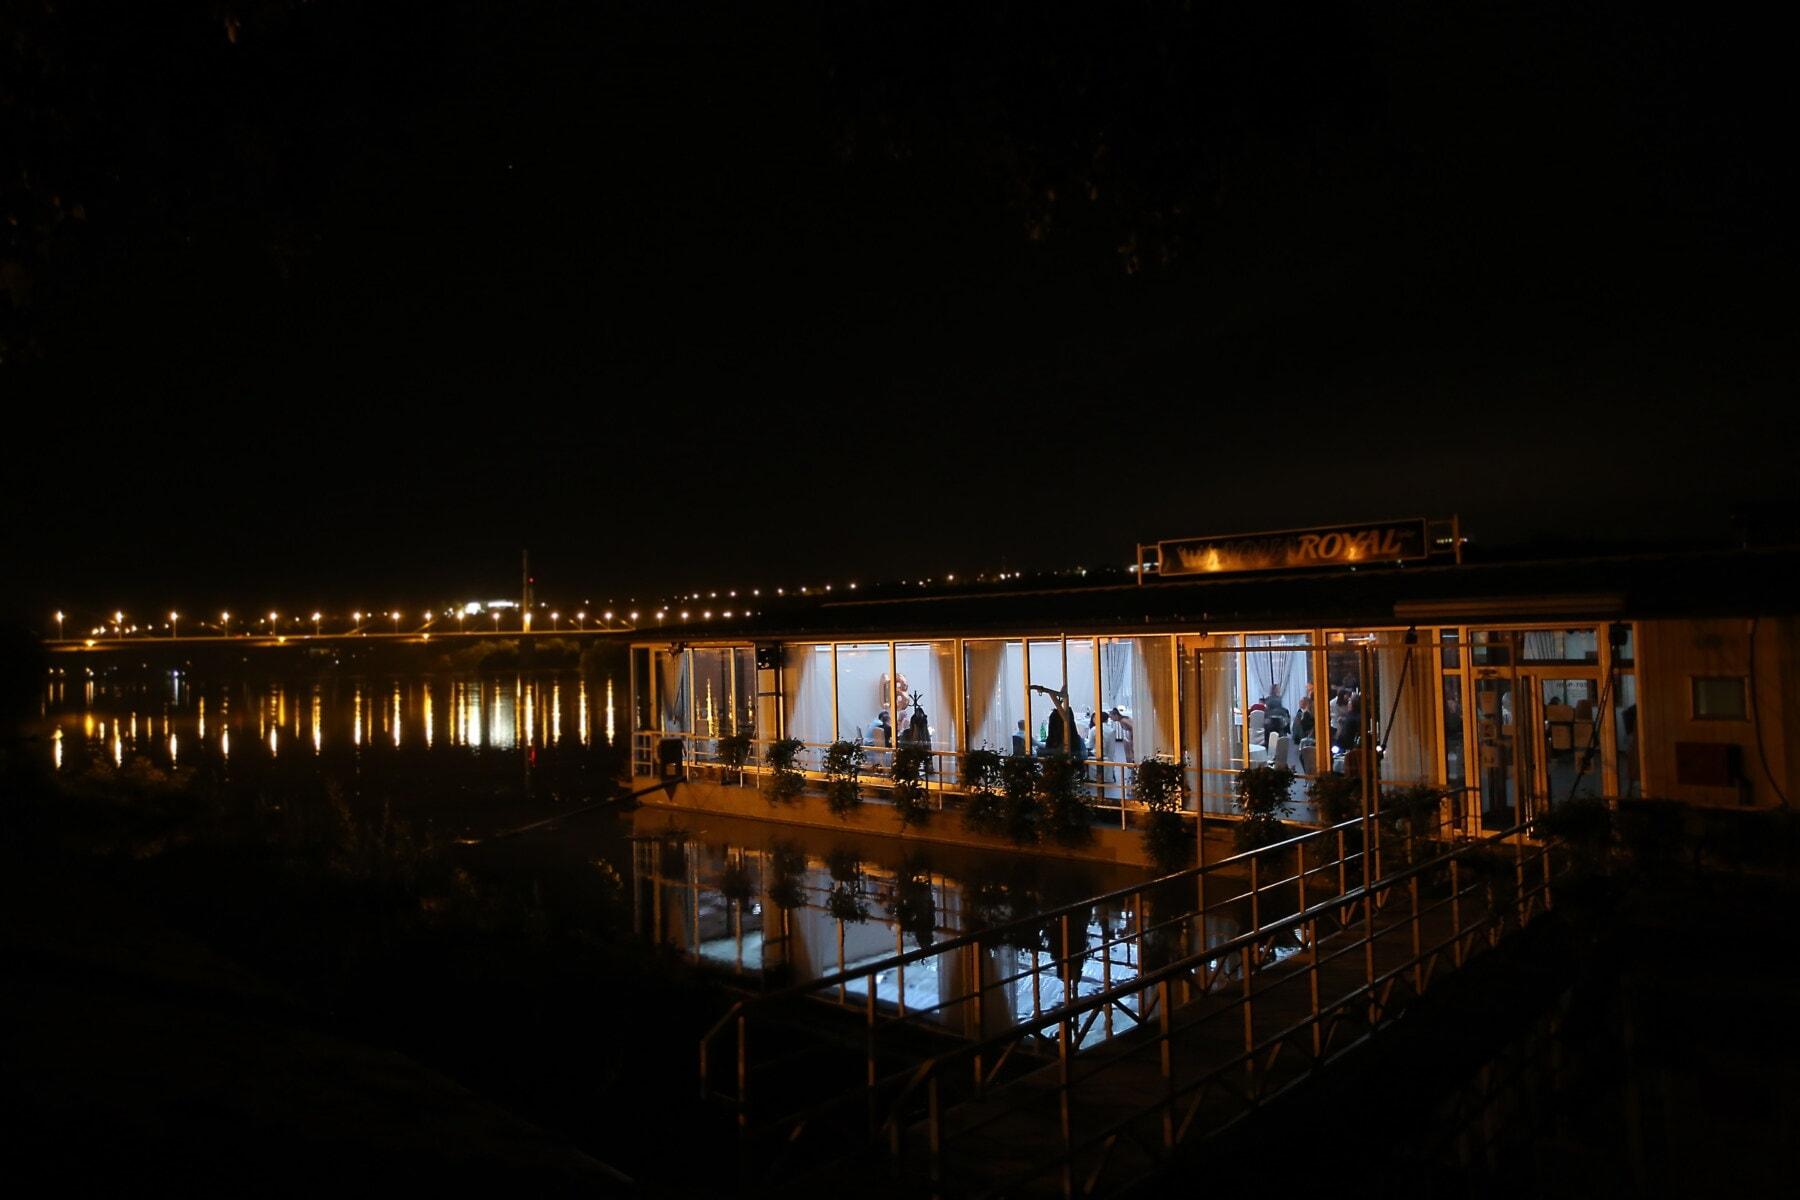 nightclub, night, nighttime, darkness, cityscape, riverbank, river, water, reflection, light